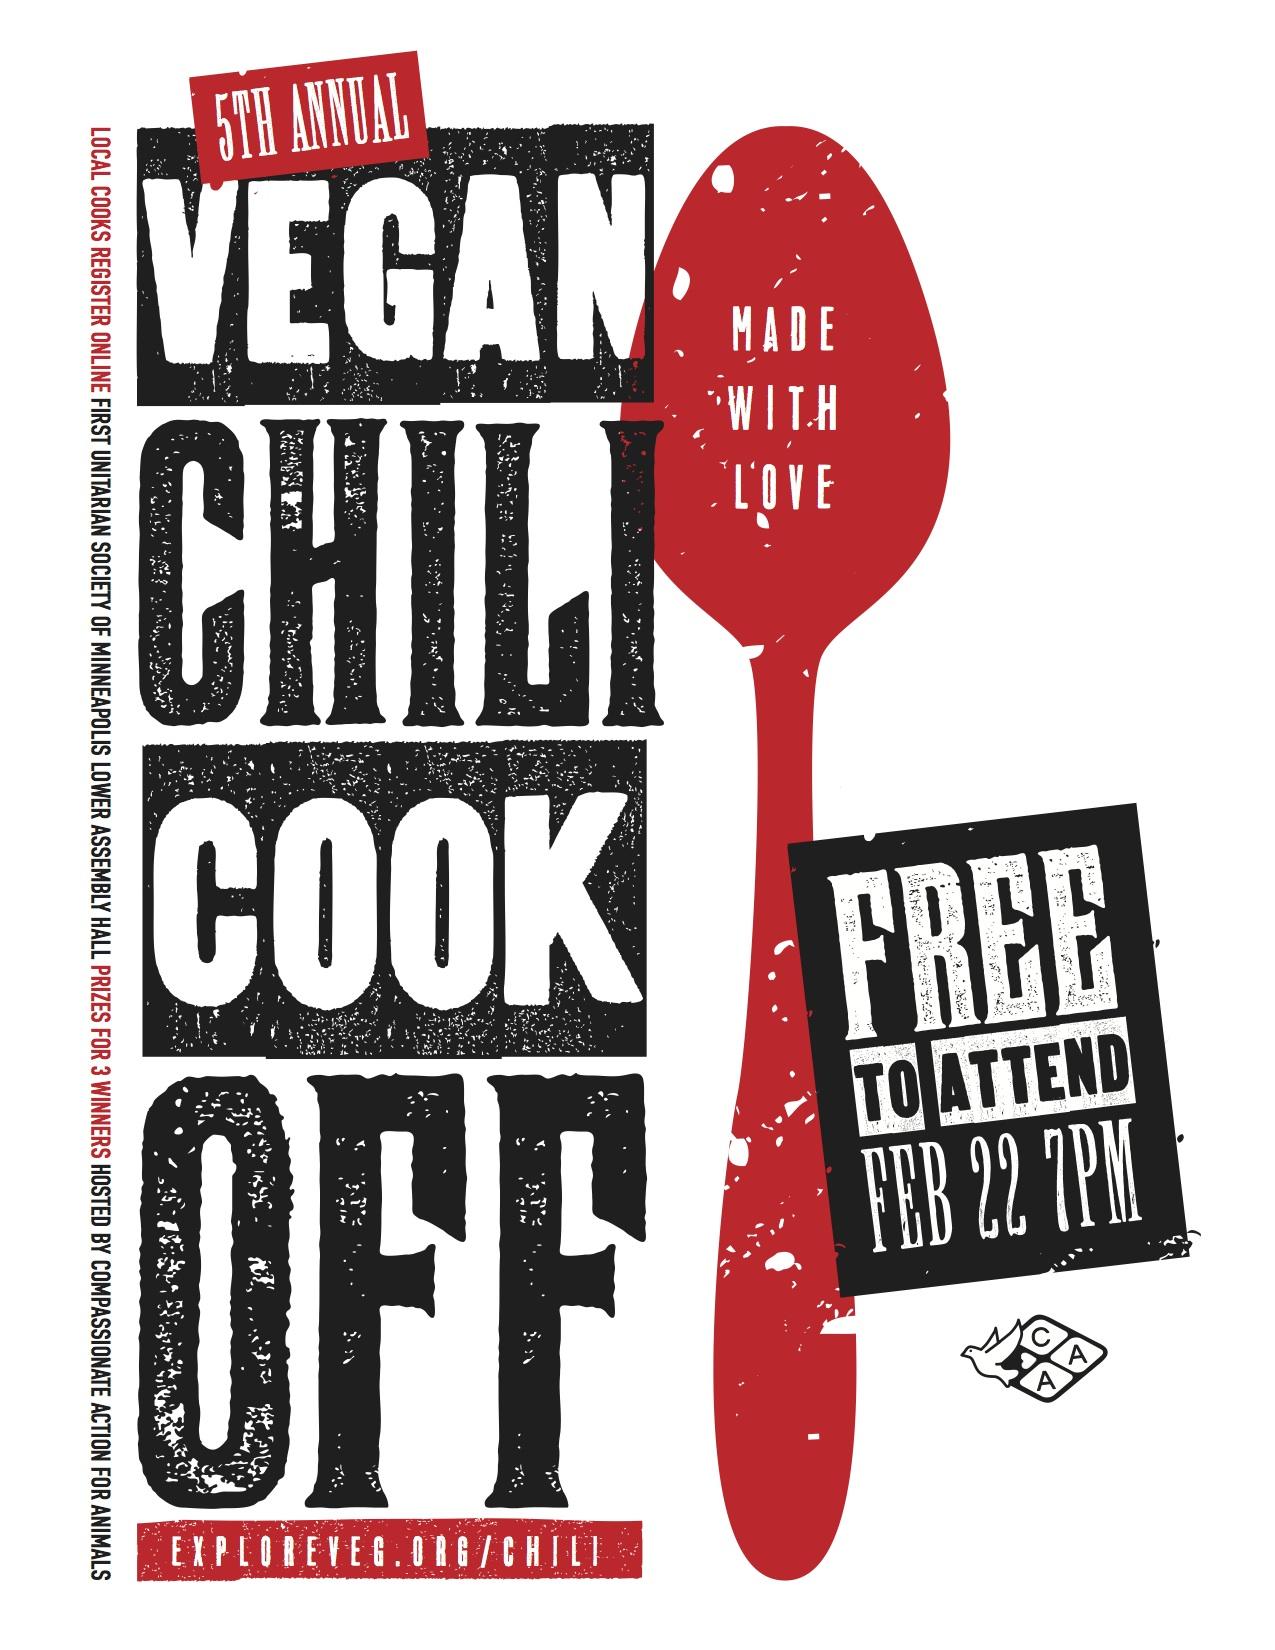 5th annual vegan chili cook